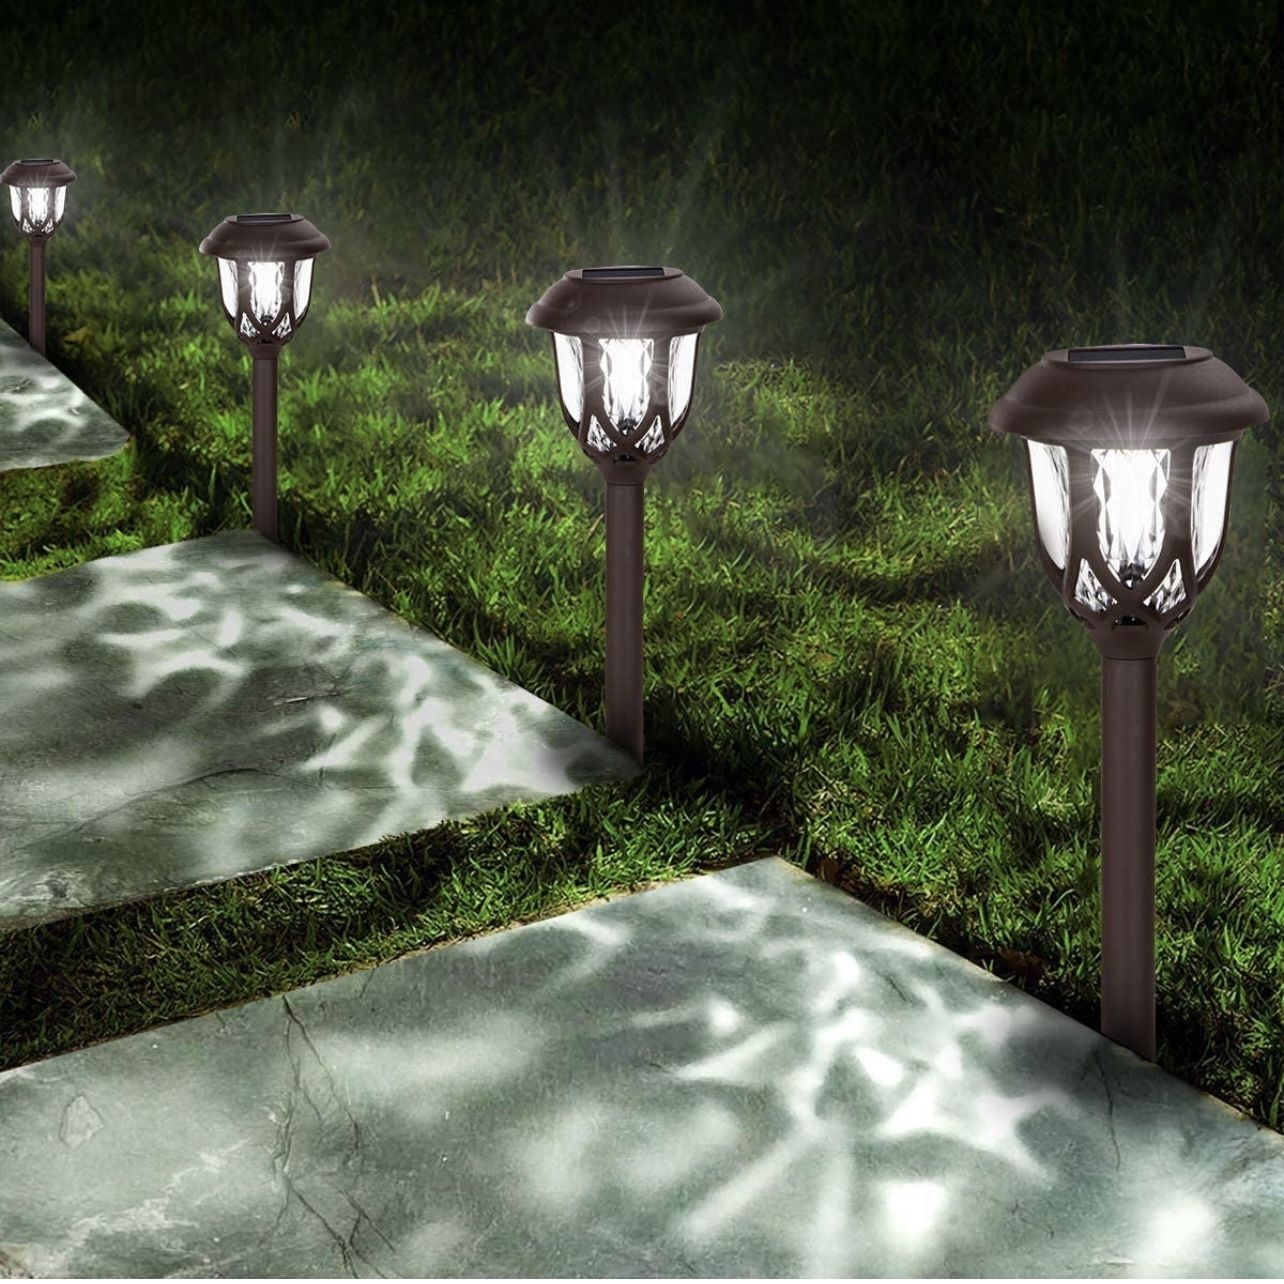 Solar Lights Outdoor Decorative,10 Packs Solar Pathway Lights,Powered Landscape Lighting,Waterproof Solar Powered Garden Yard Lights for Walkway Sidew